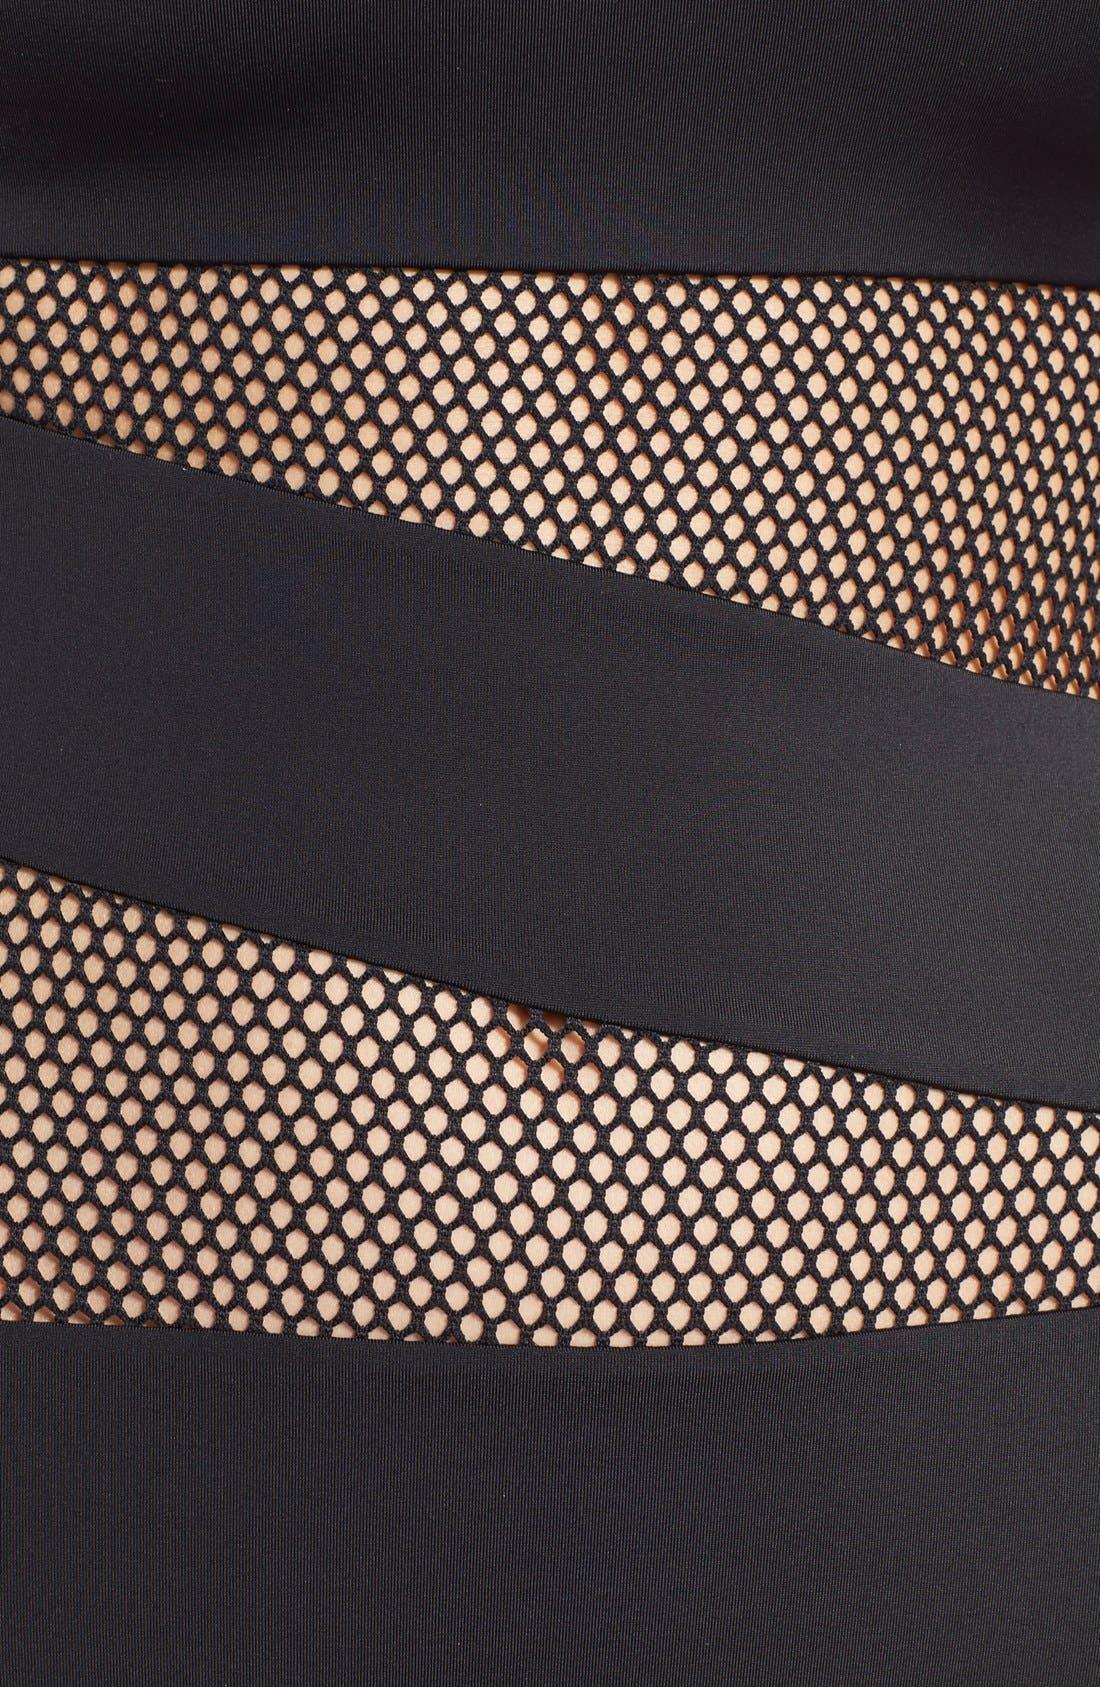 DKNY,                             'Mesh Splice' Maillot,                             Alternate thumbnail 3, color,                             002